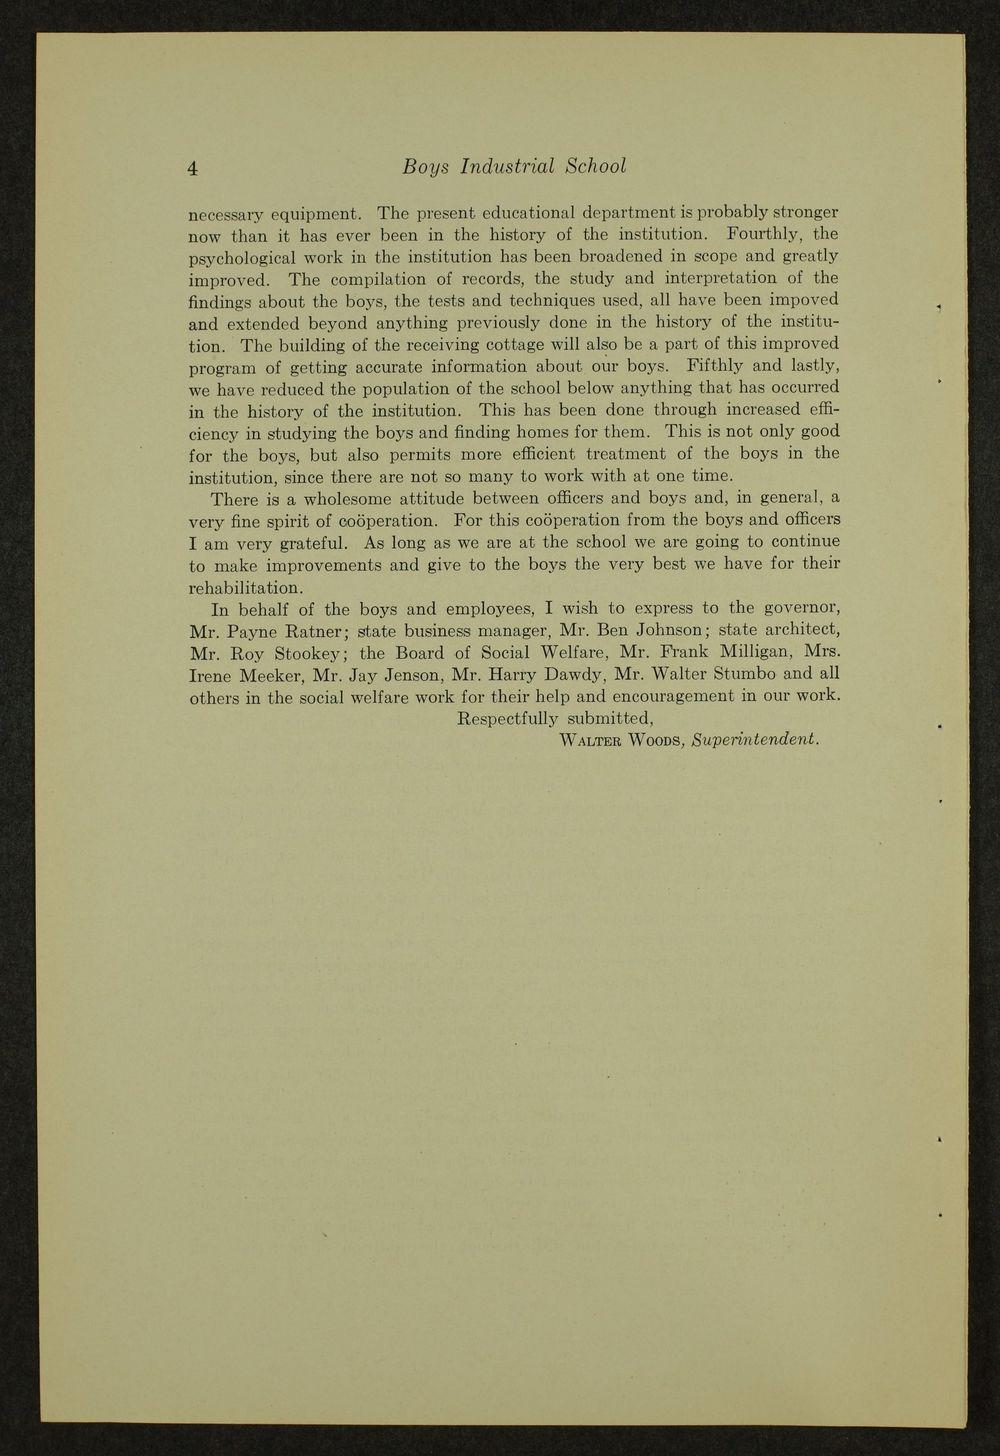 Biennial report of the Boys Industrial School, 1940 - 4